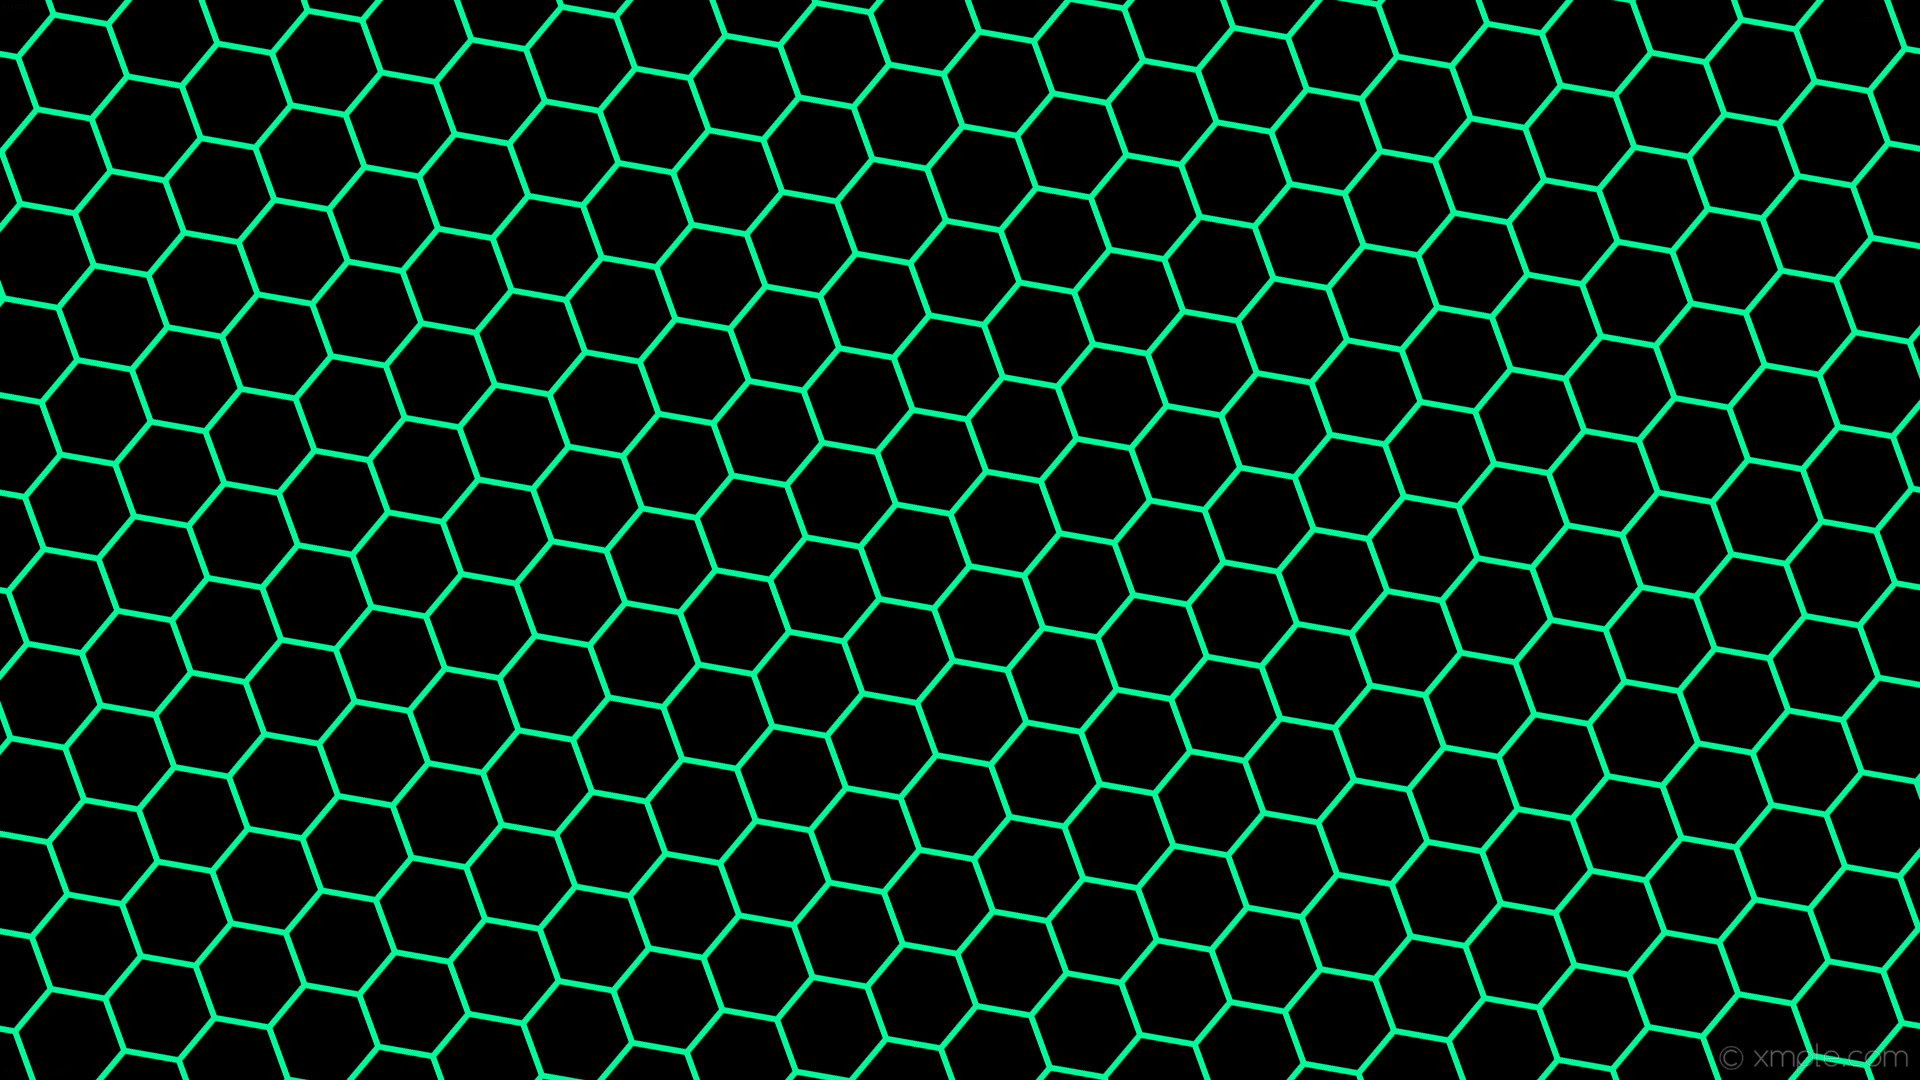 wallpaper beehive honeycomb green hexagon black medium spring green #000000  #00fa9a diagonal 20°